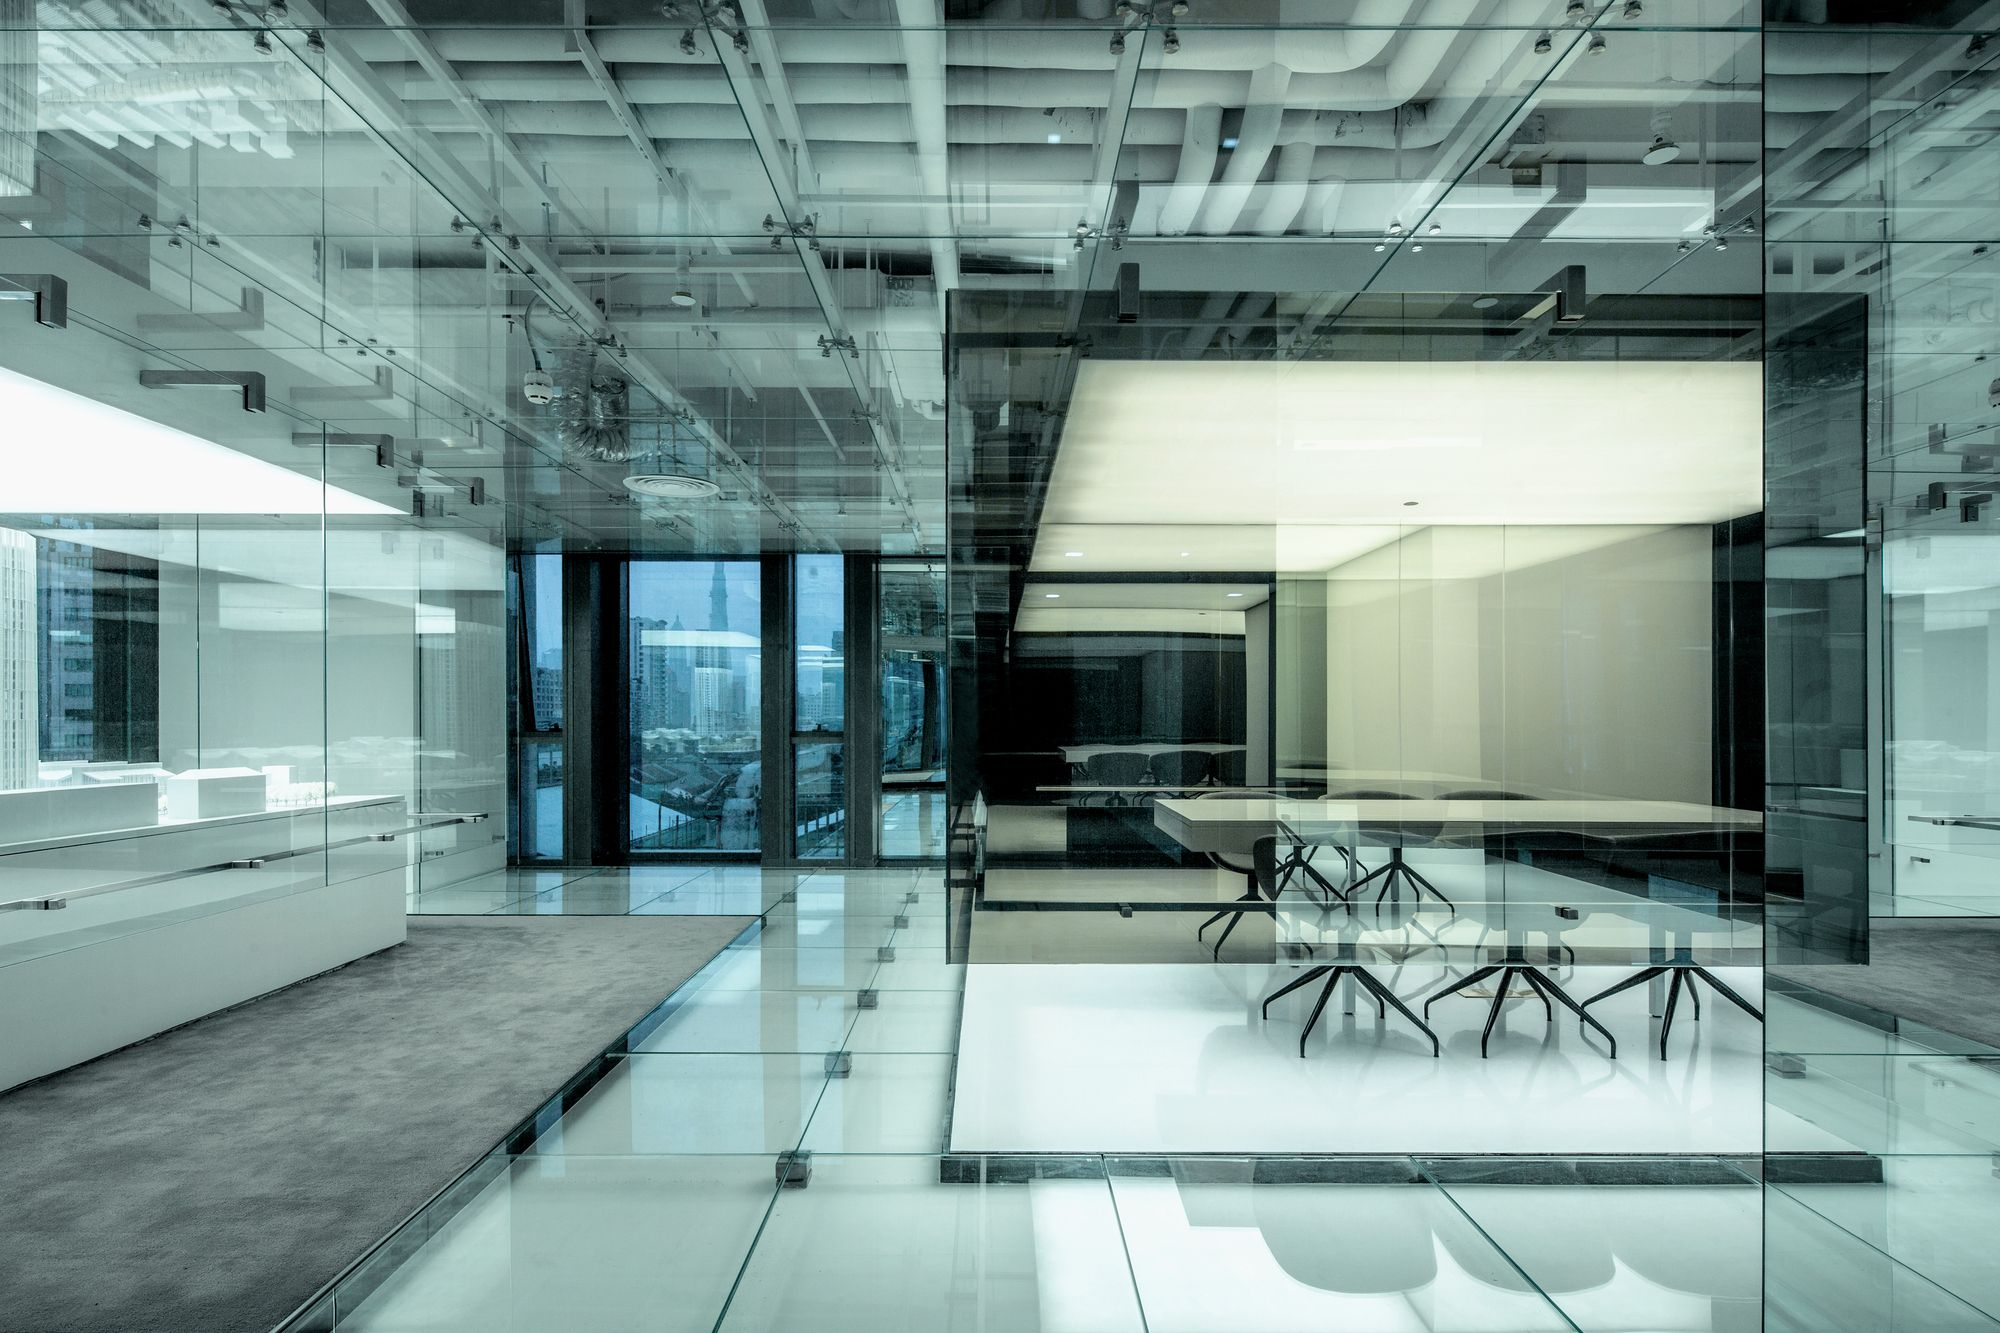 A glass office - SOHO China / AIM Architecture